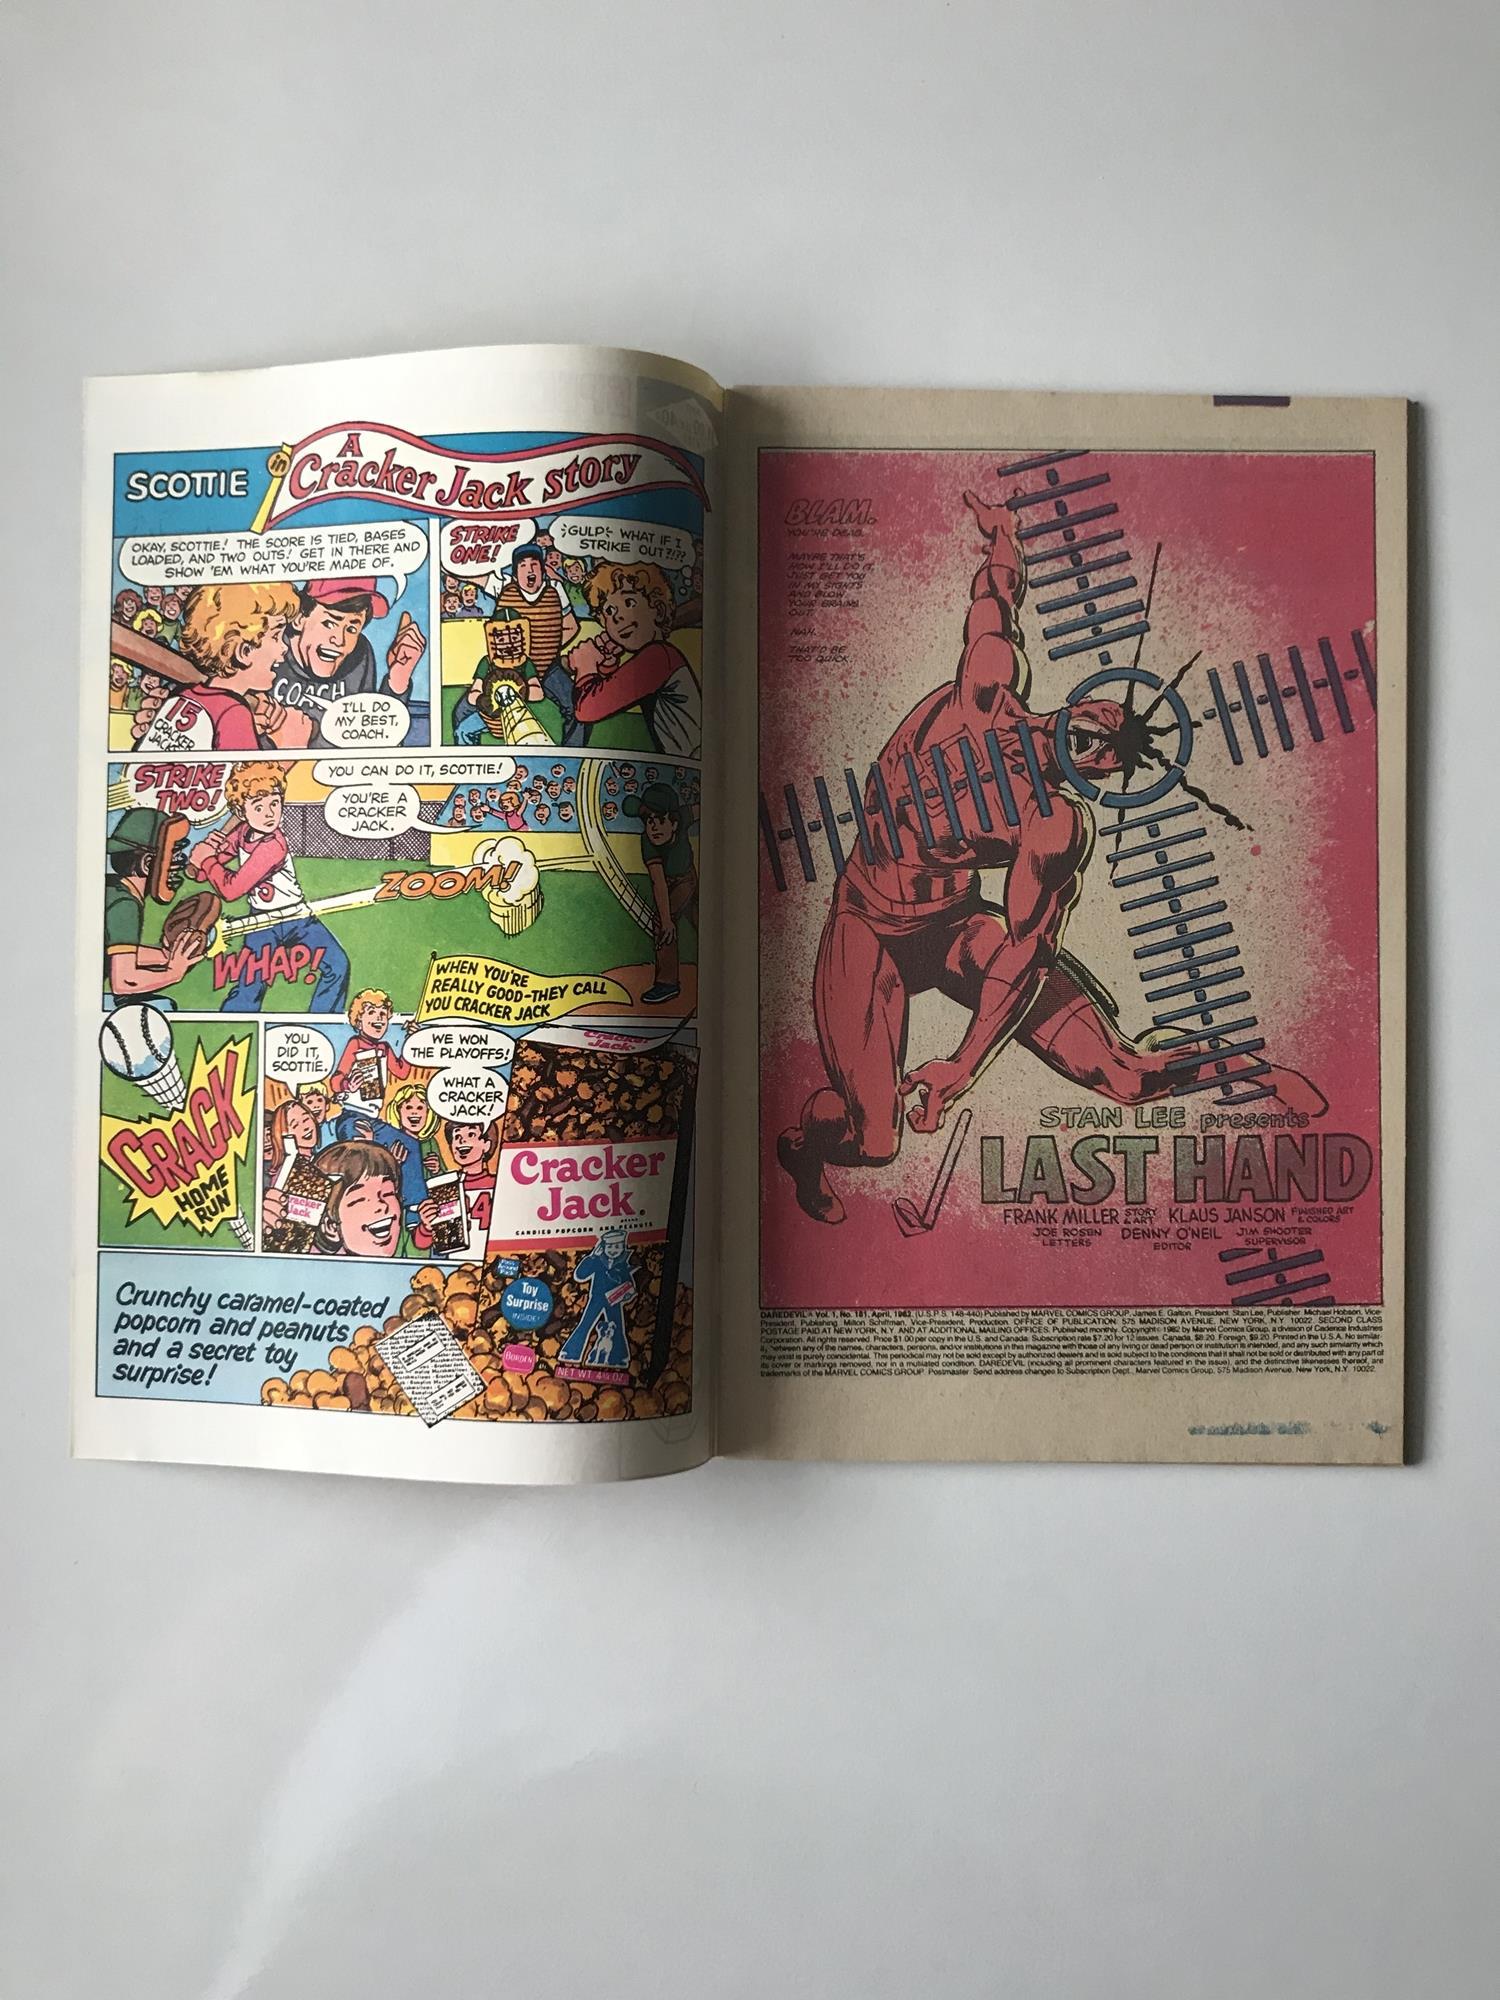 Lot 36 - DAREDEVIL # 181 (1982 - MARVEL - Cents/Pence Copy) - 'Death' of Elektra + Appearances by Bullseye,